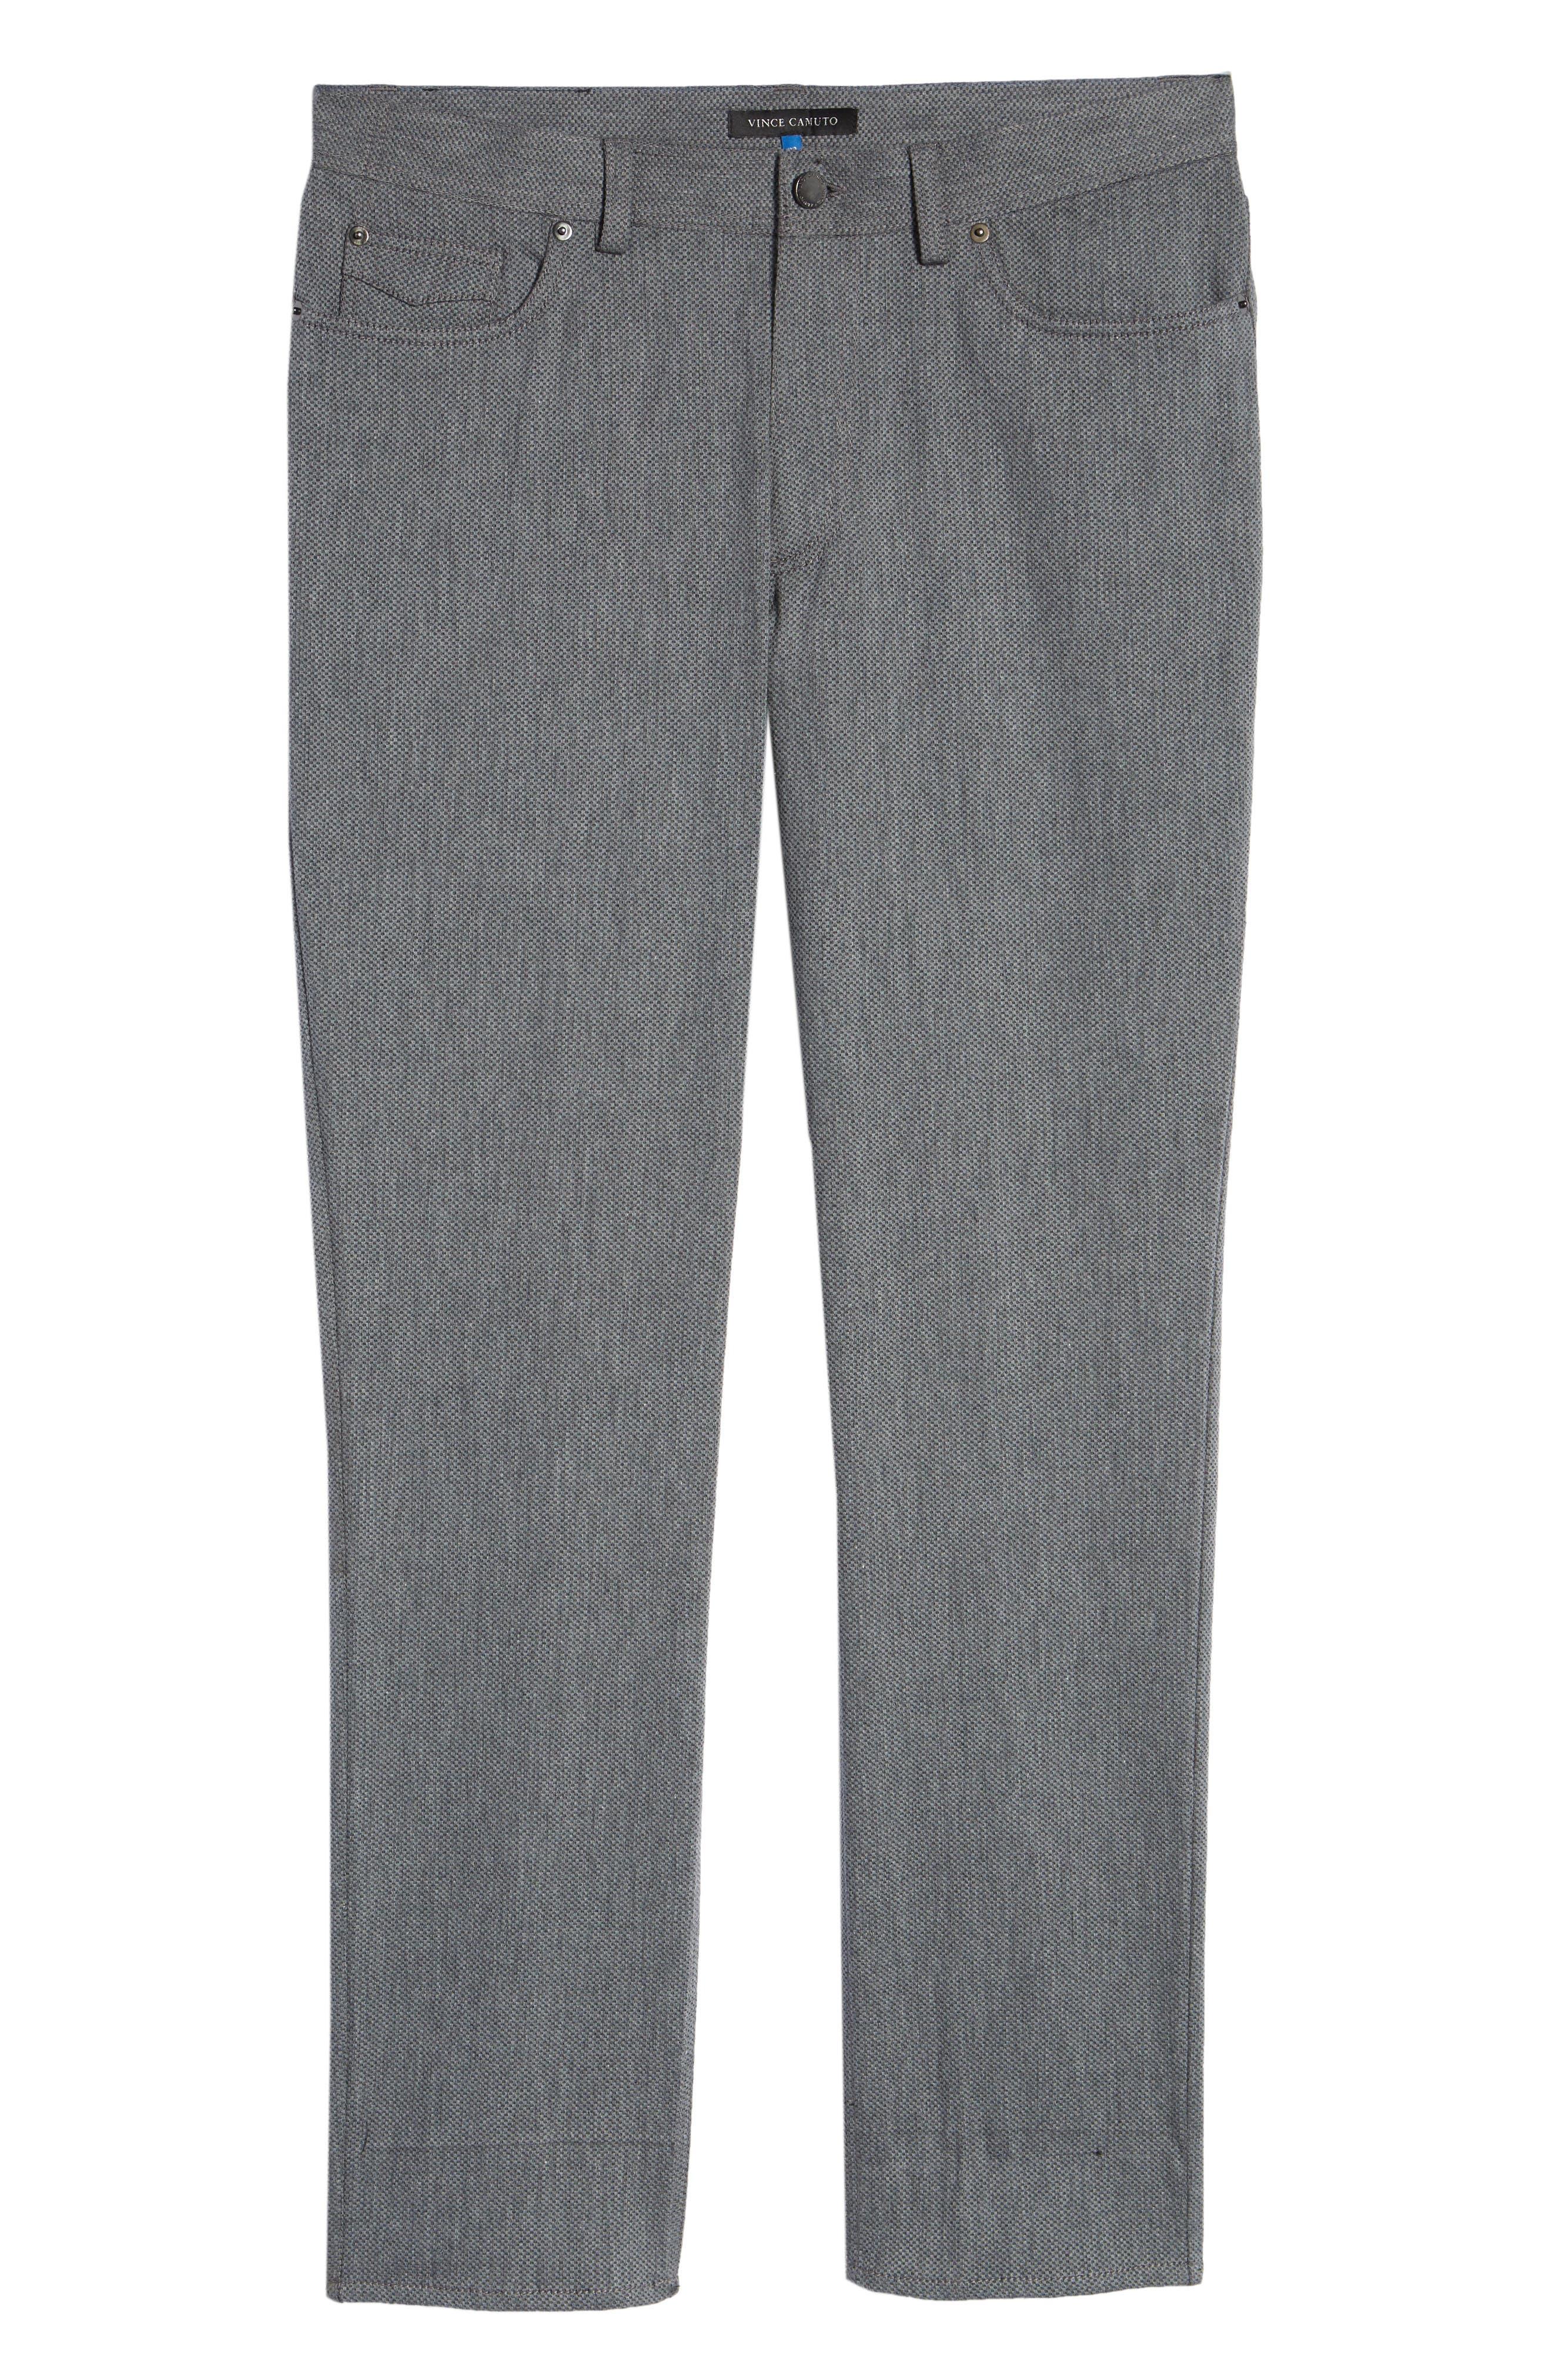 VINCE CAMUTO, Straight Leg Five Pocket Stretch Pants, Alternate thumbnail 6, color, HEATHER CHARCOAL CROSSHATCH